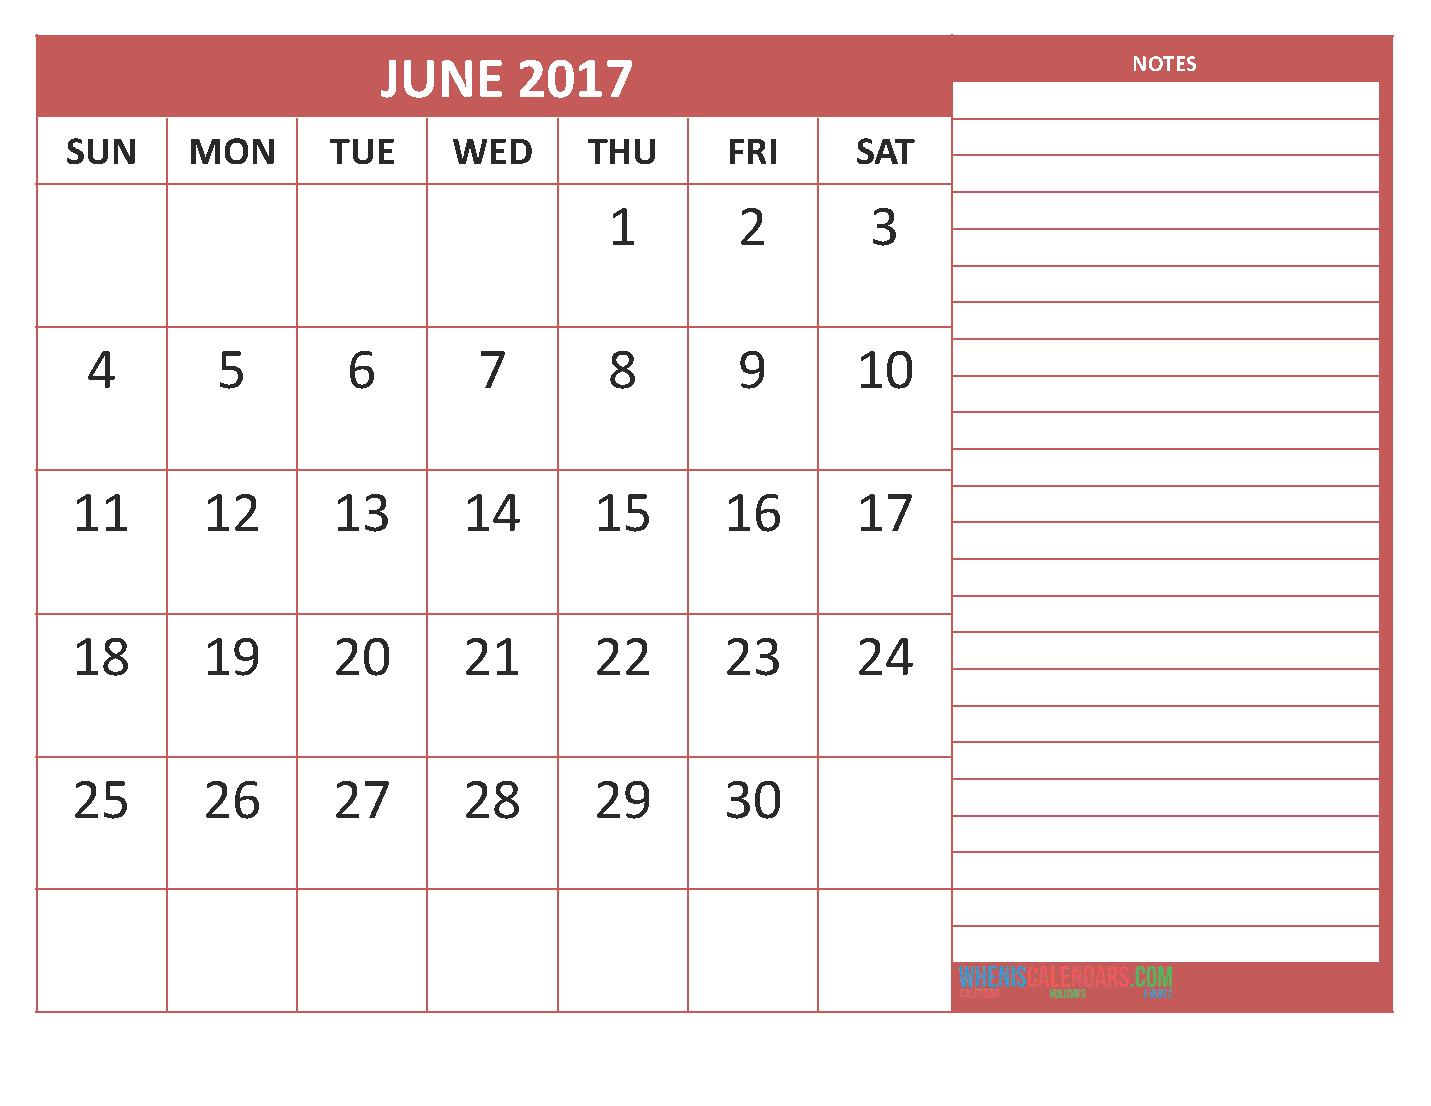 June Calendar Notes